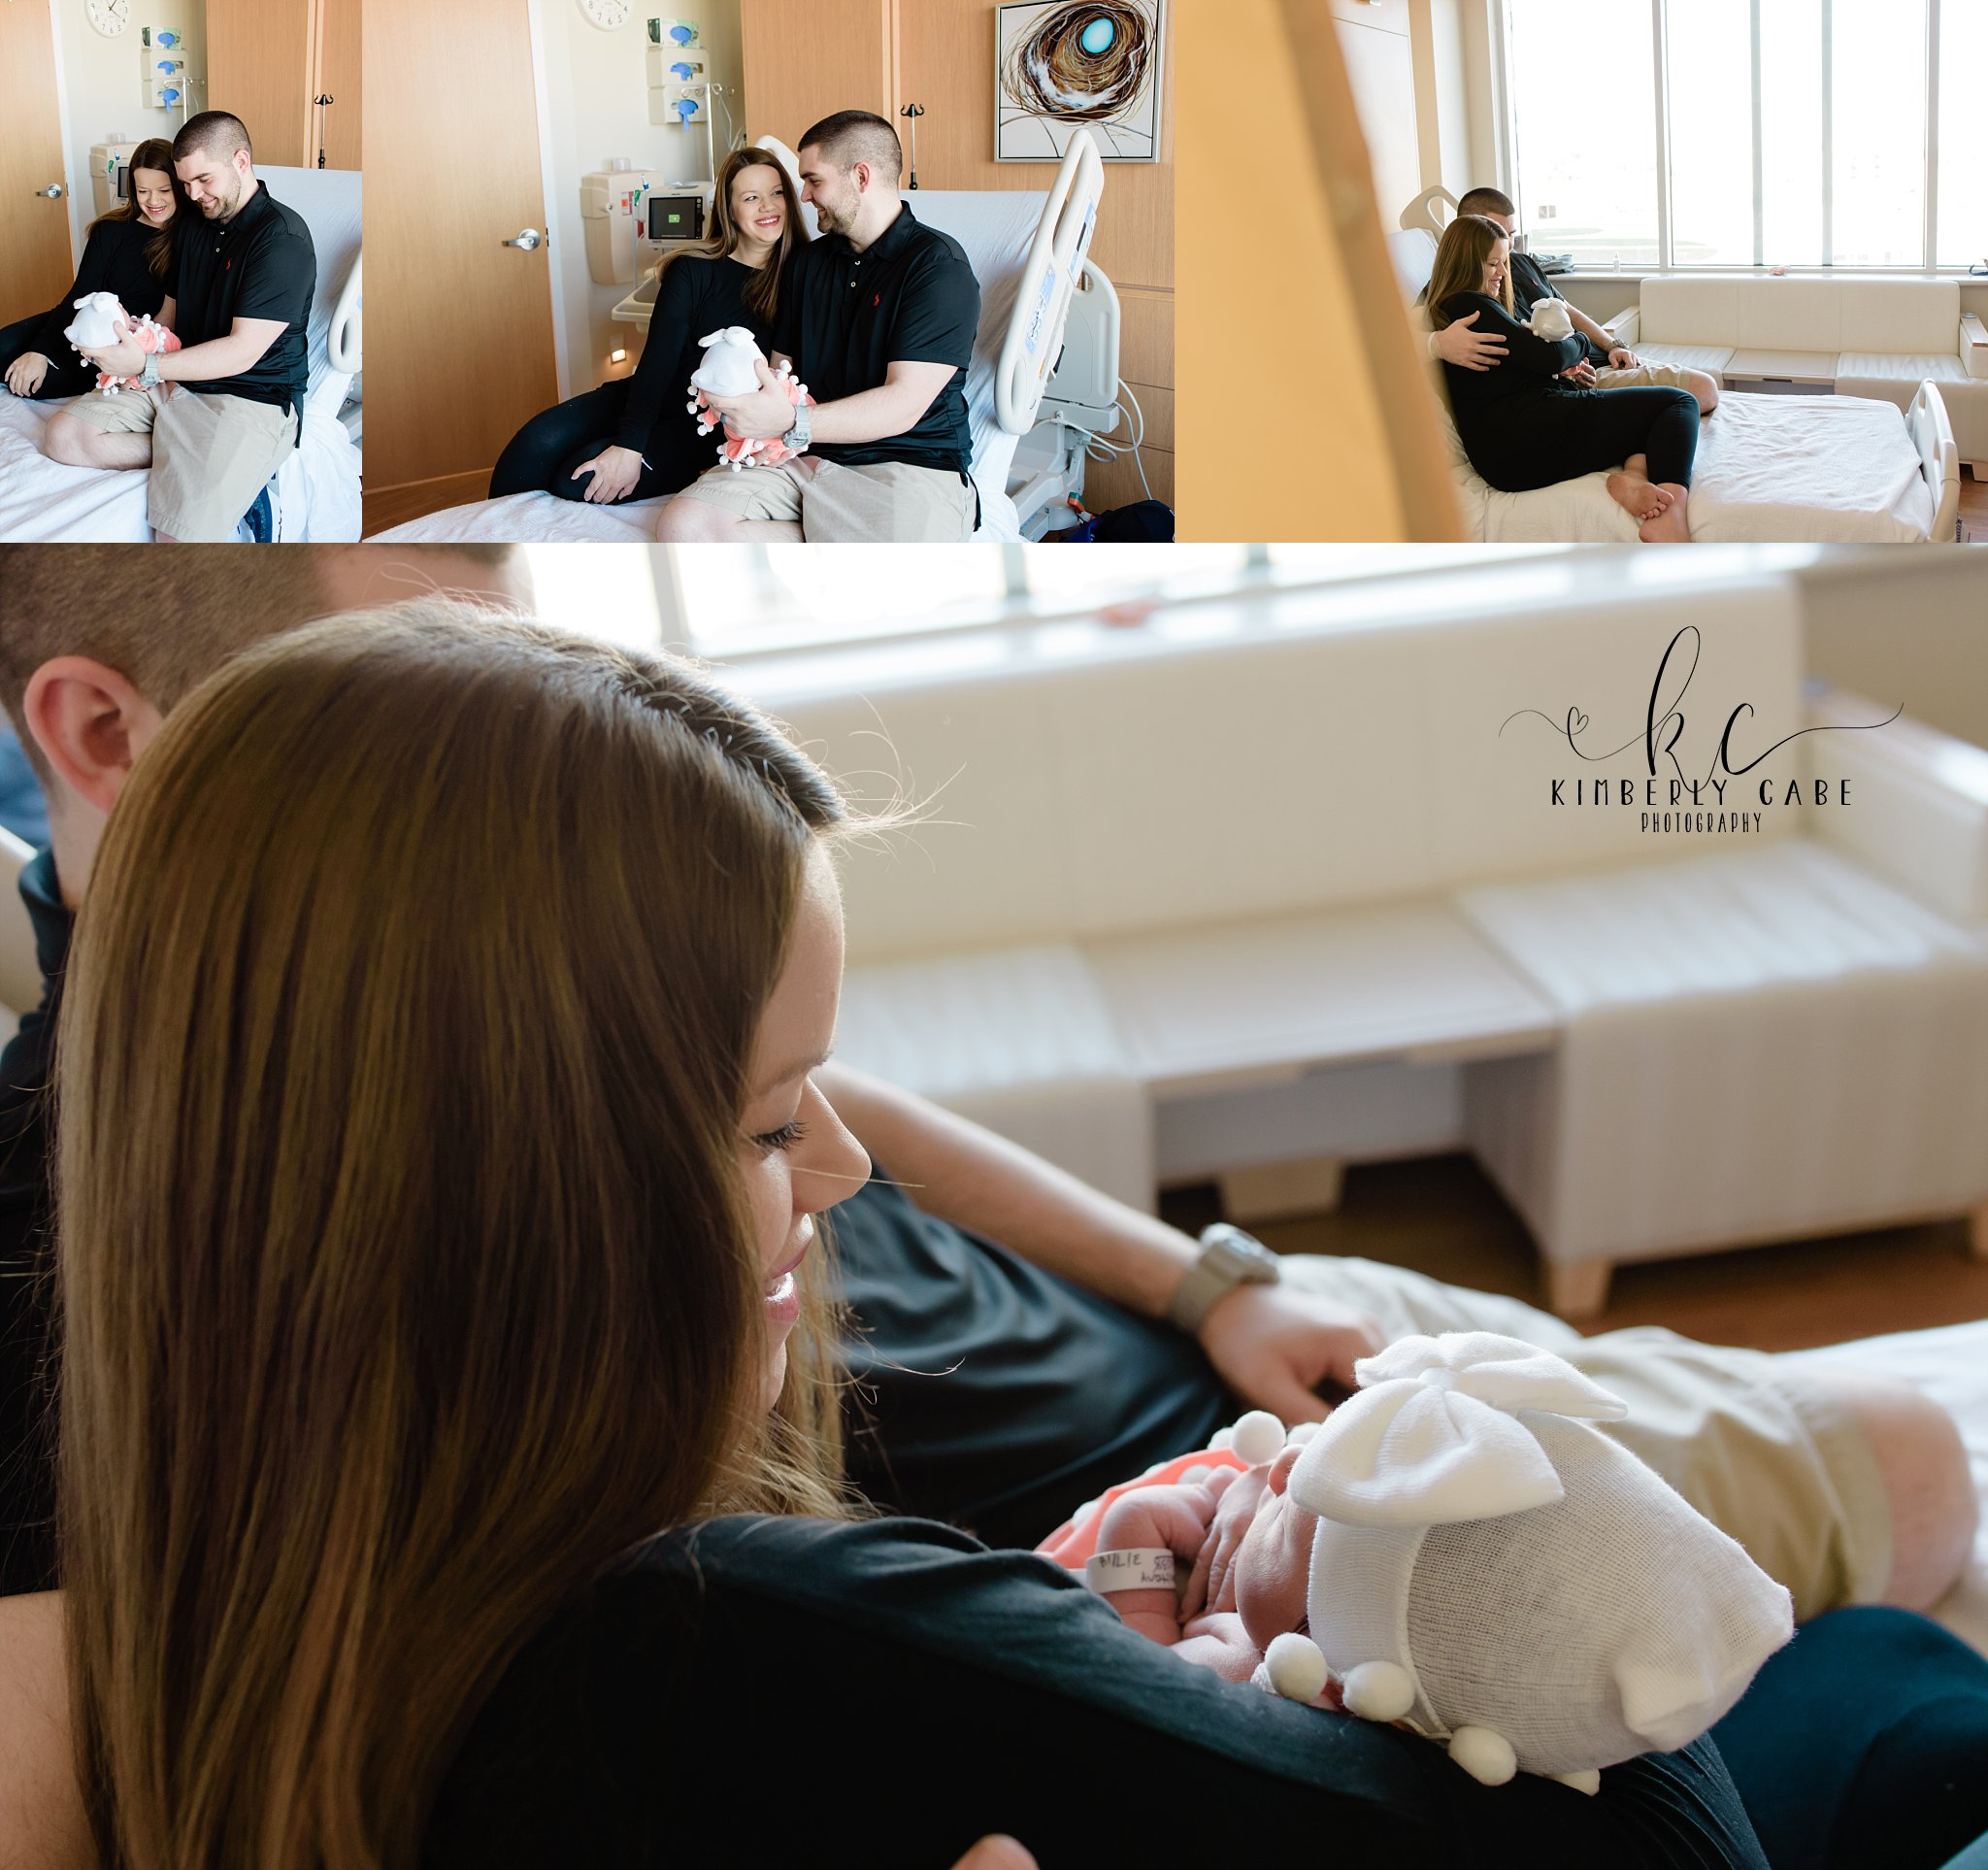 Greenville hospital newborn session